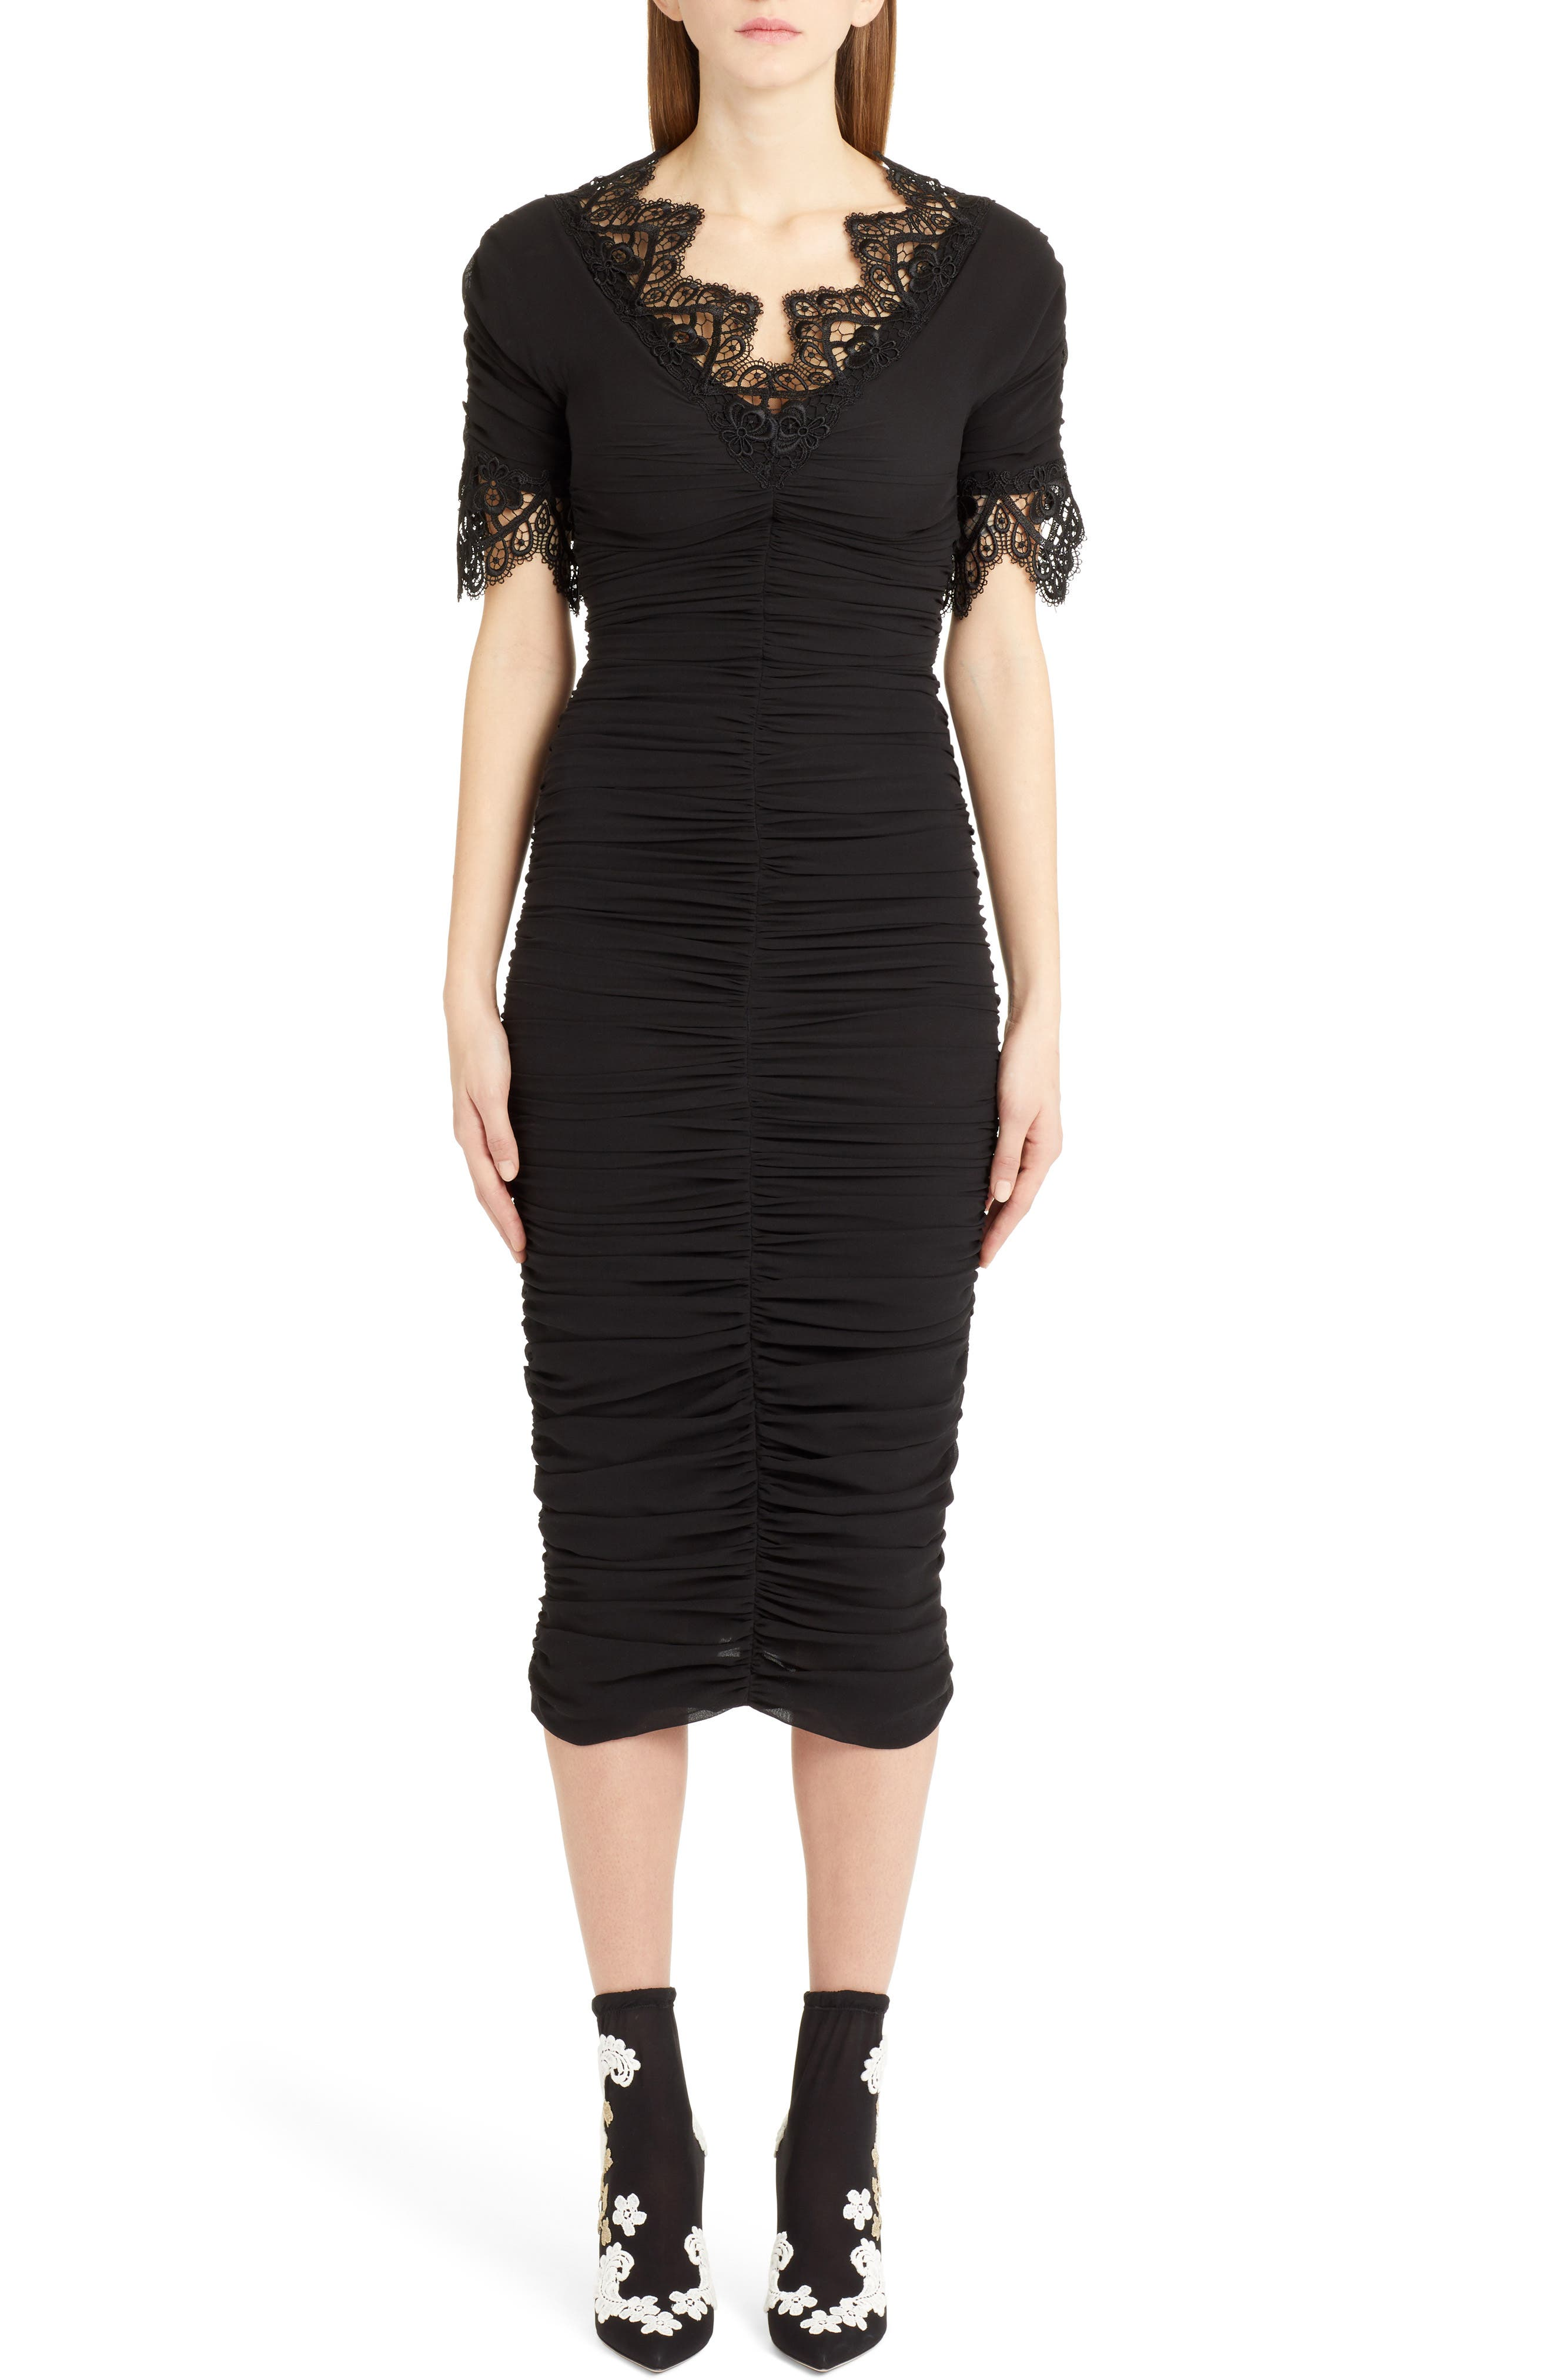 Dolce & gabbana Lace Trim Ruched Silk Blend Dress, US / 40 IT - Black